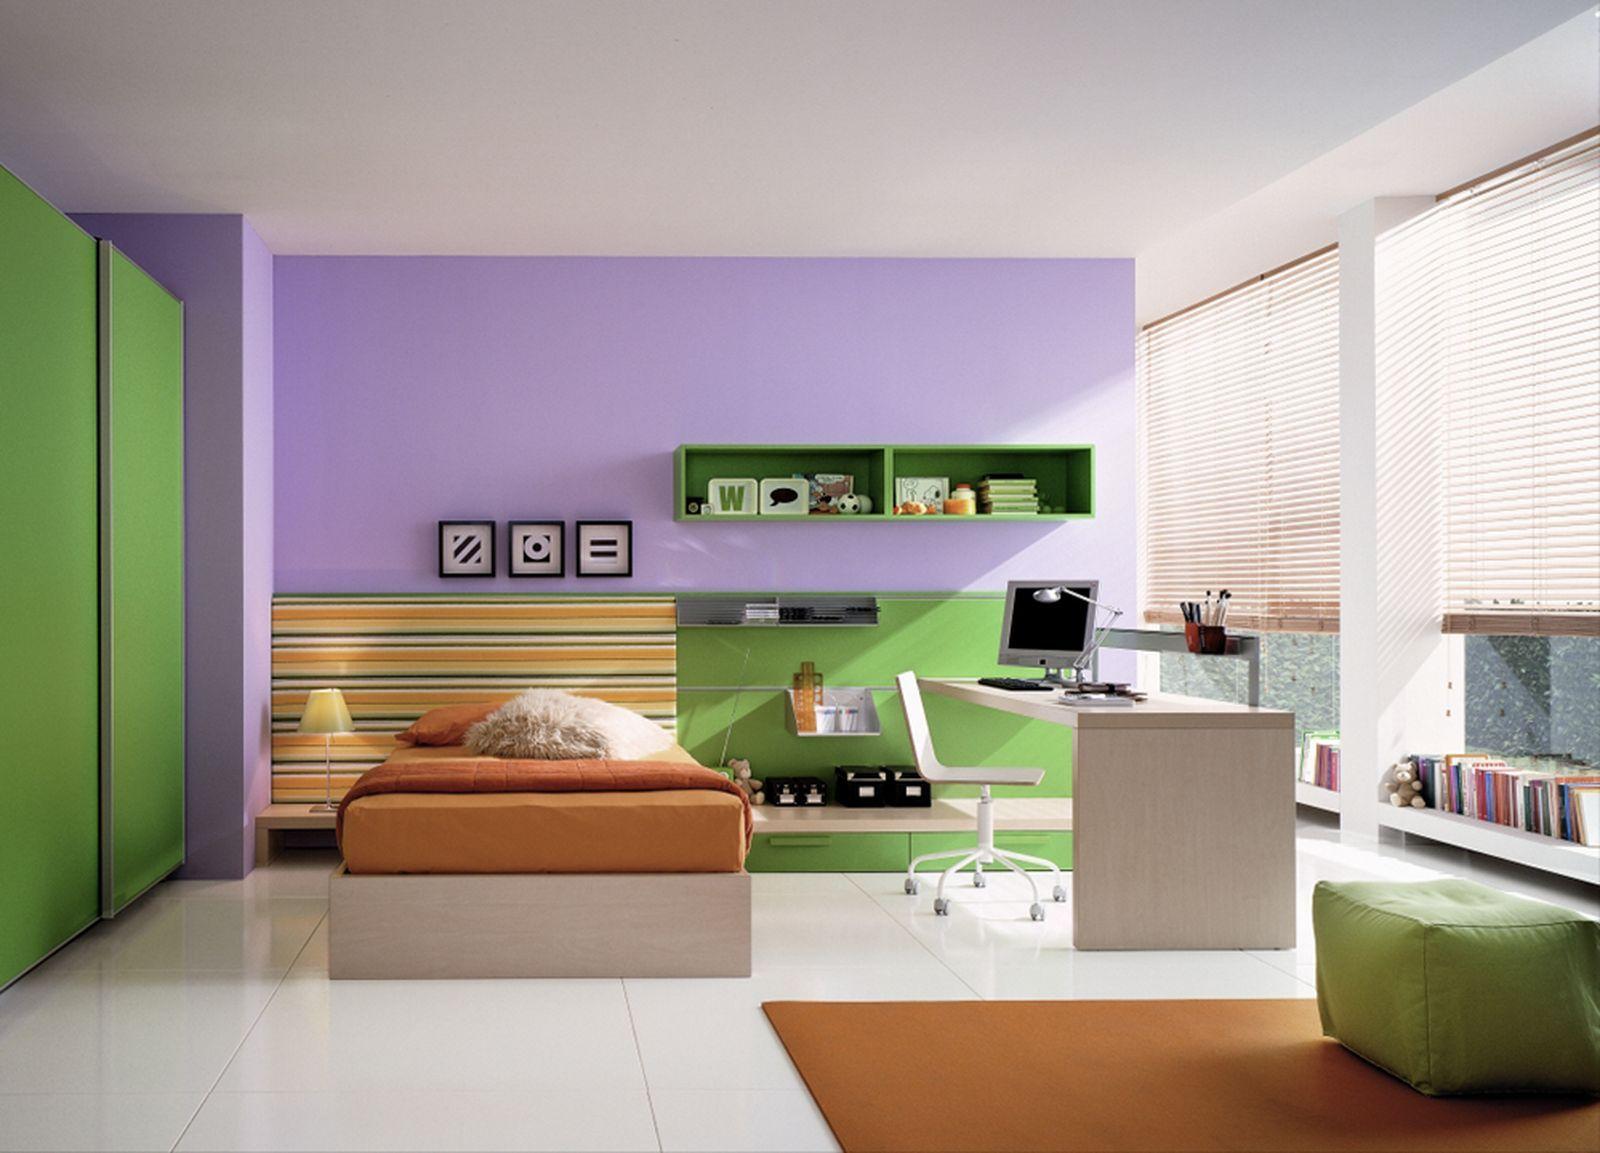 20 Contemporary Kids Room Interior Design Ideas Interior